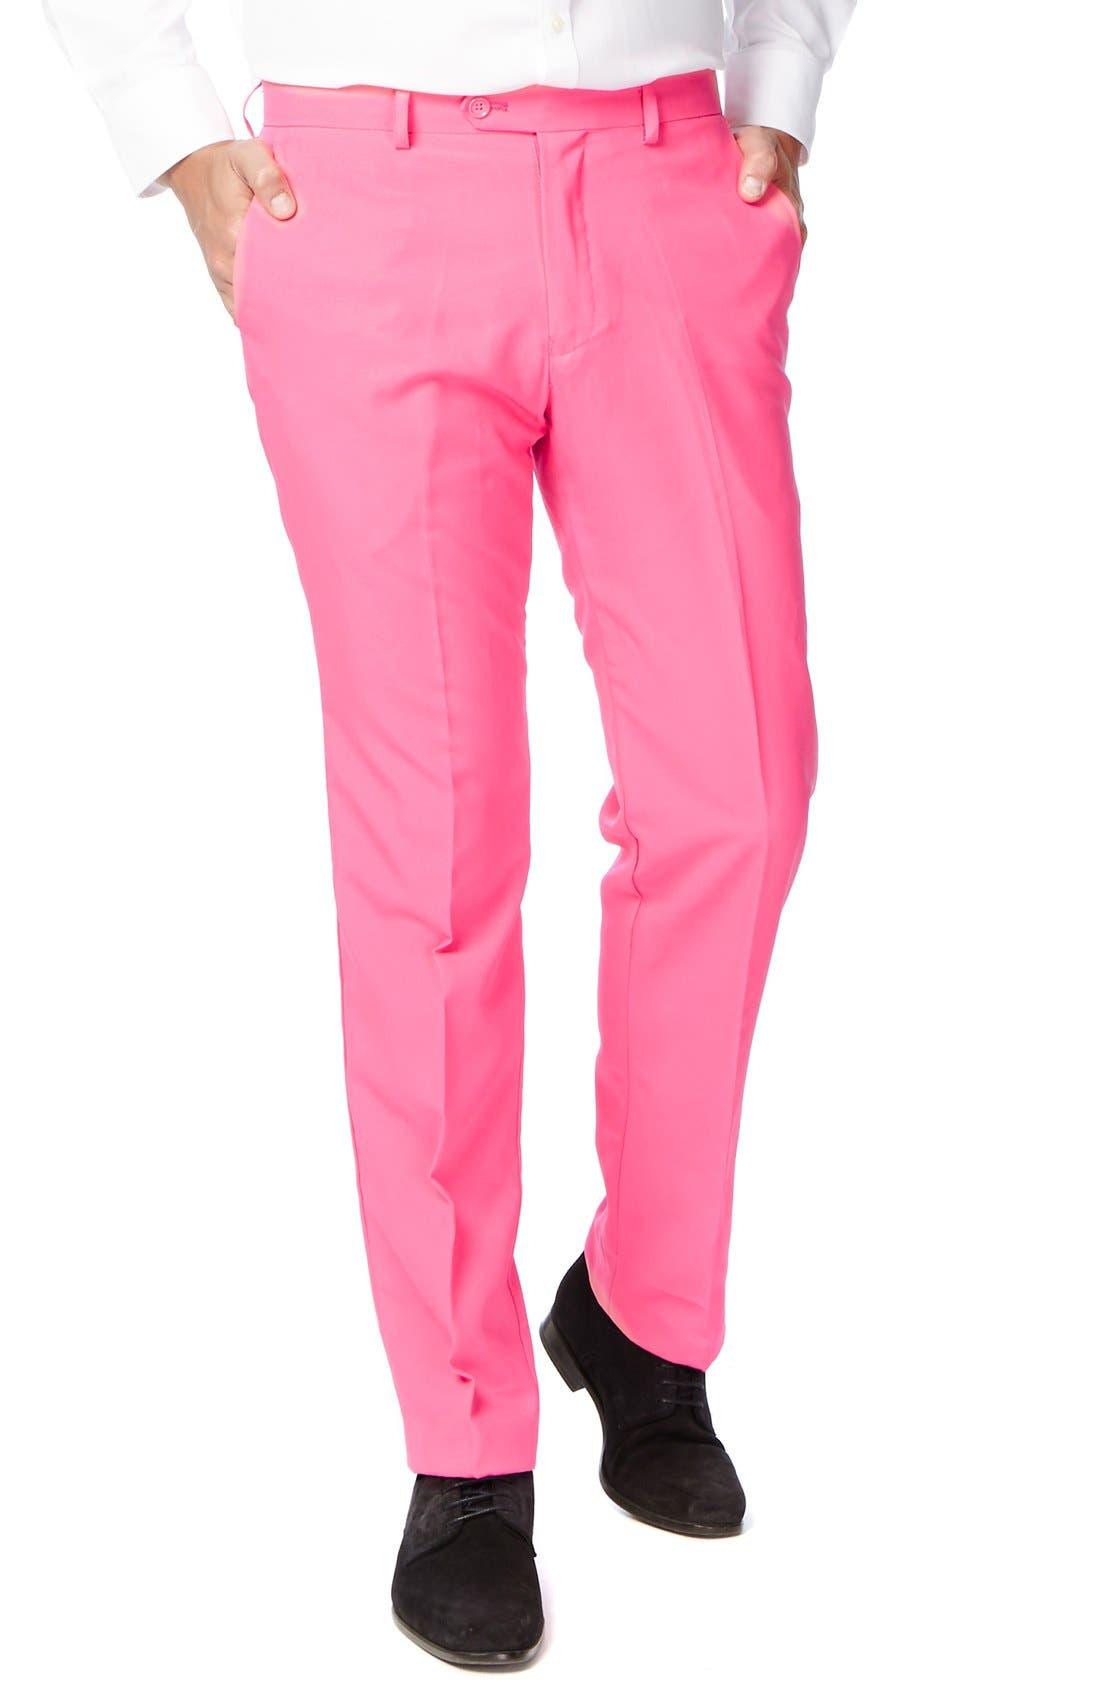 'Mr. Pink' Trim Fit Two-Piece Suit with Tie,                             Alternate thumbnail 3, color,                             650